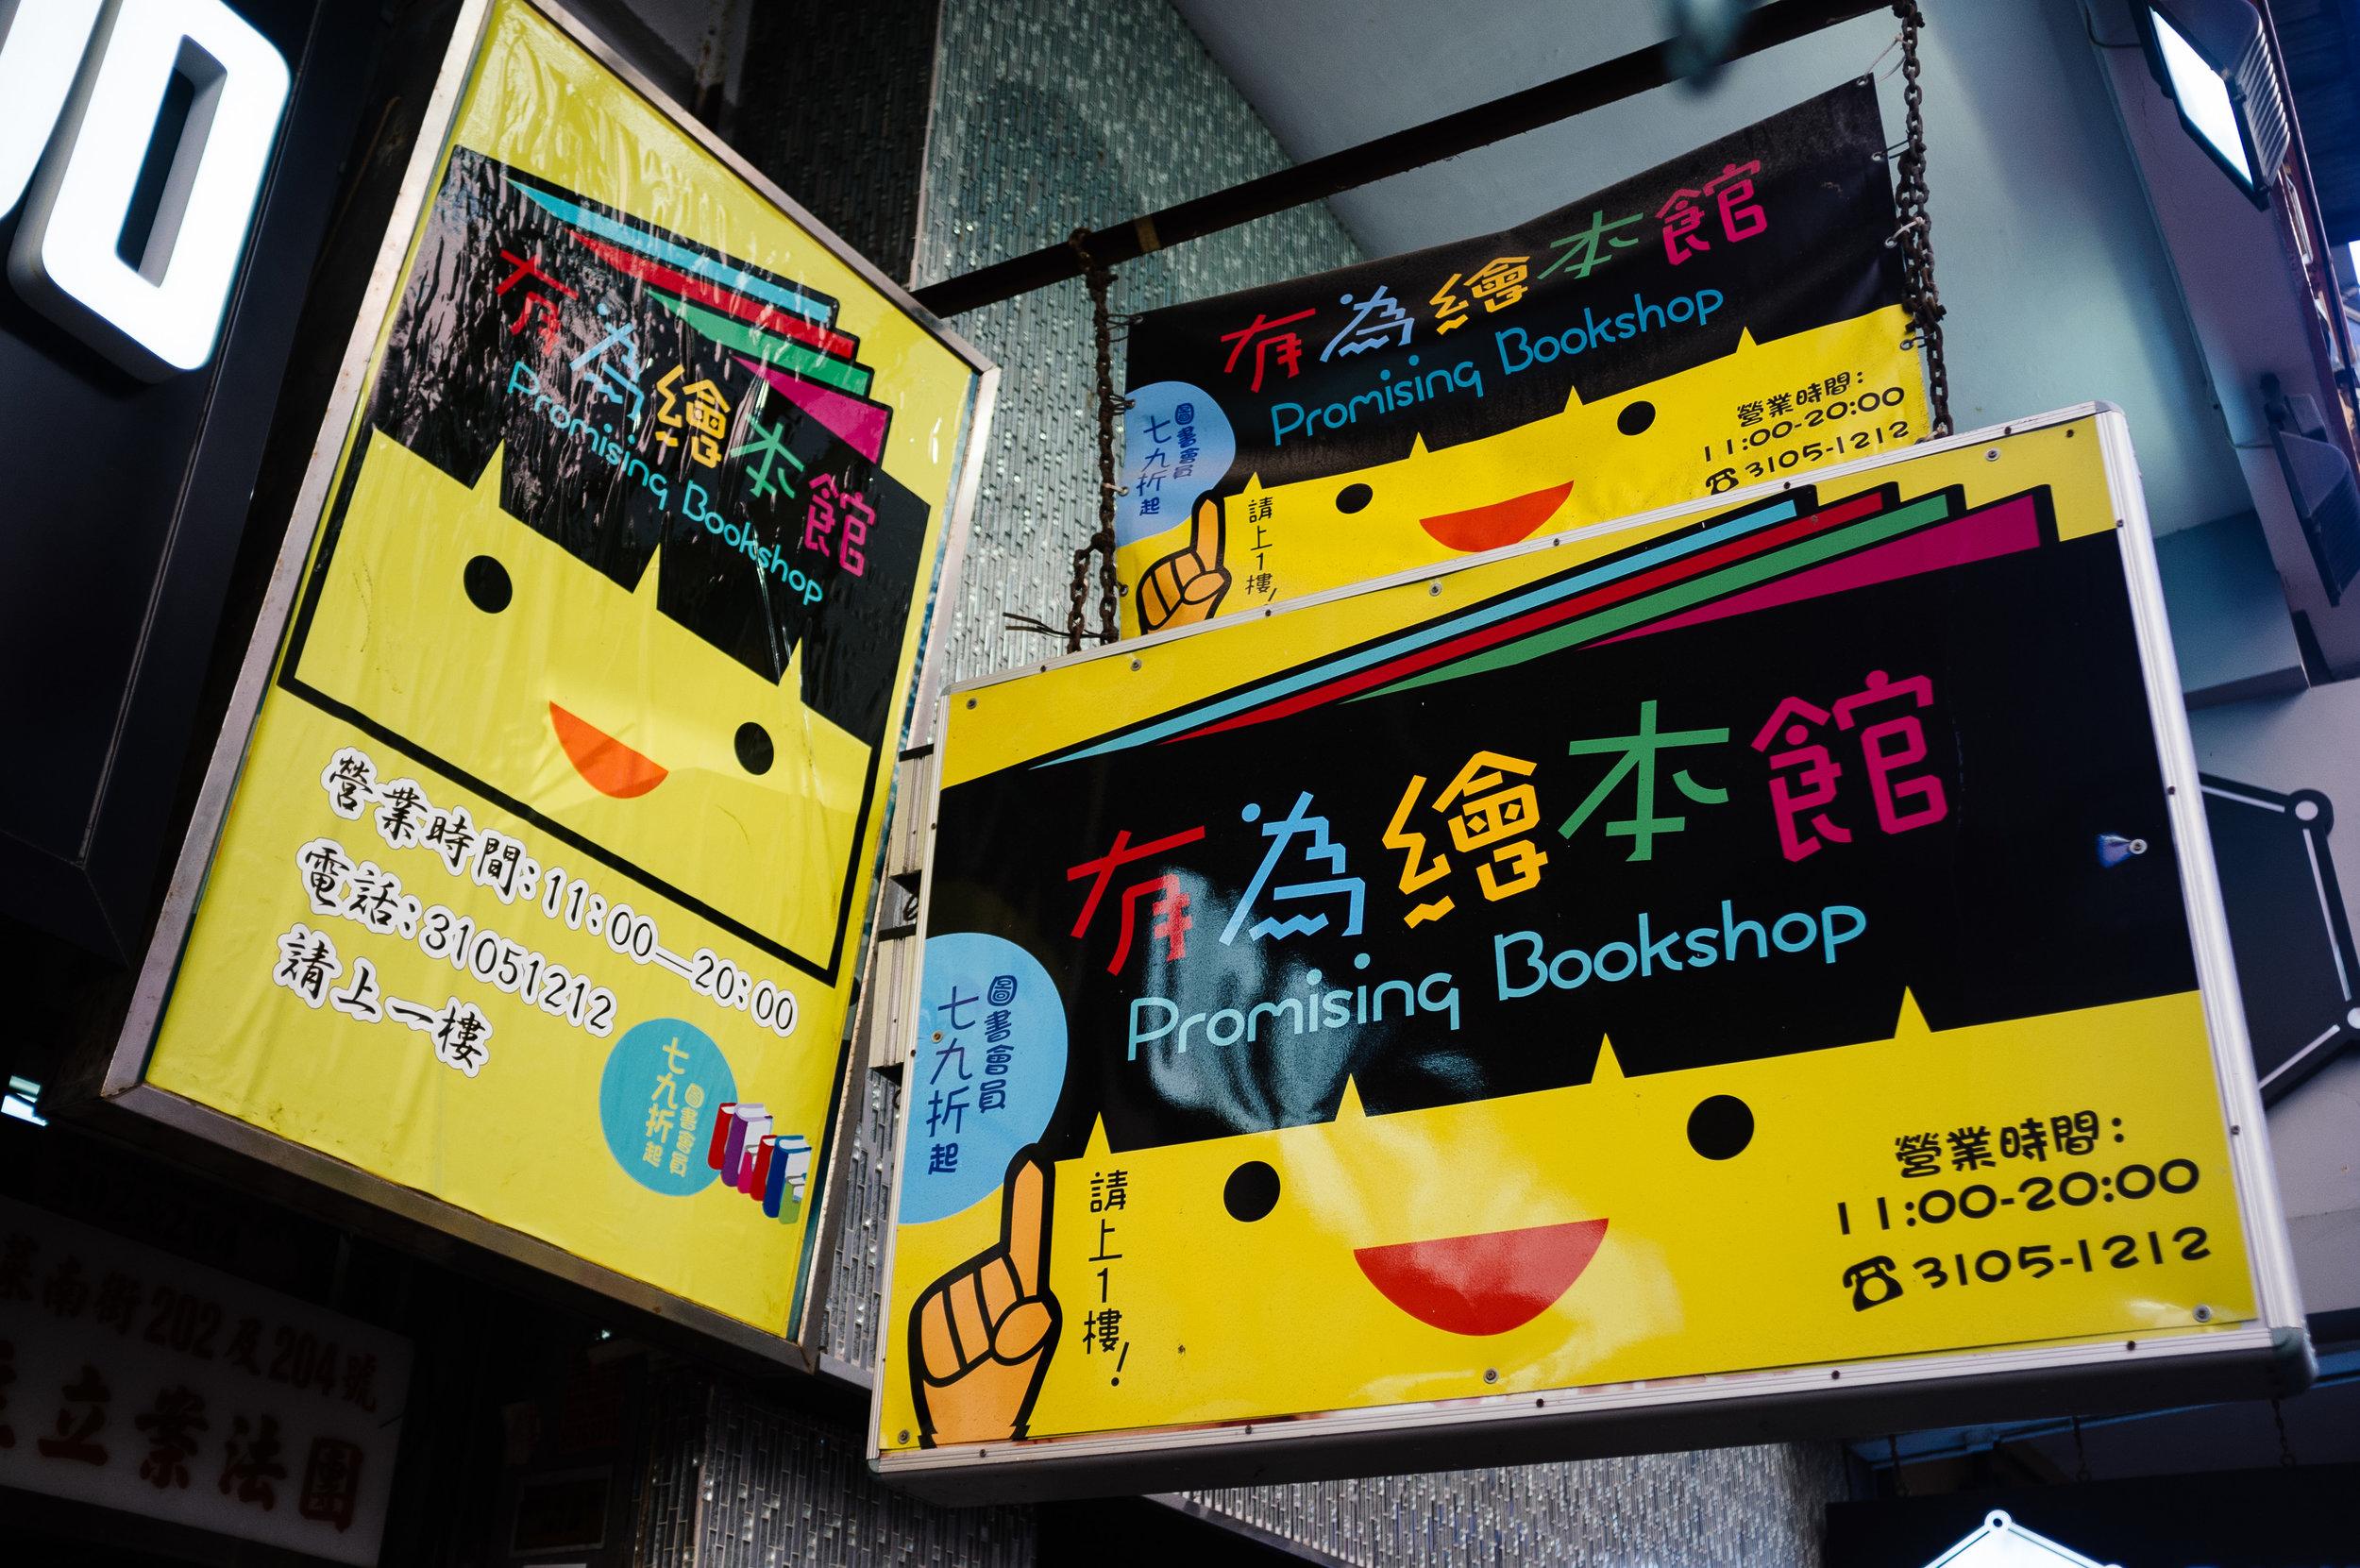 Mong Kok Bookshop.jpg